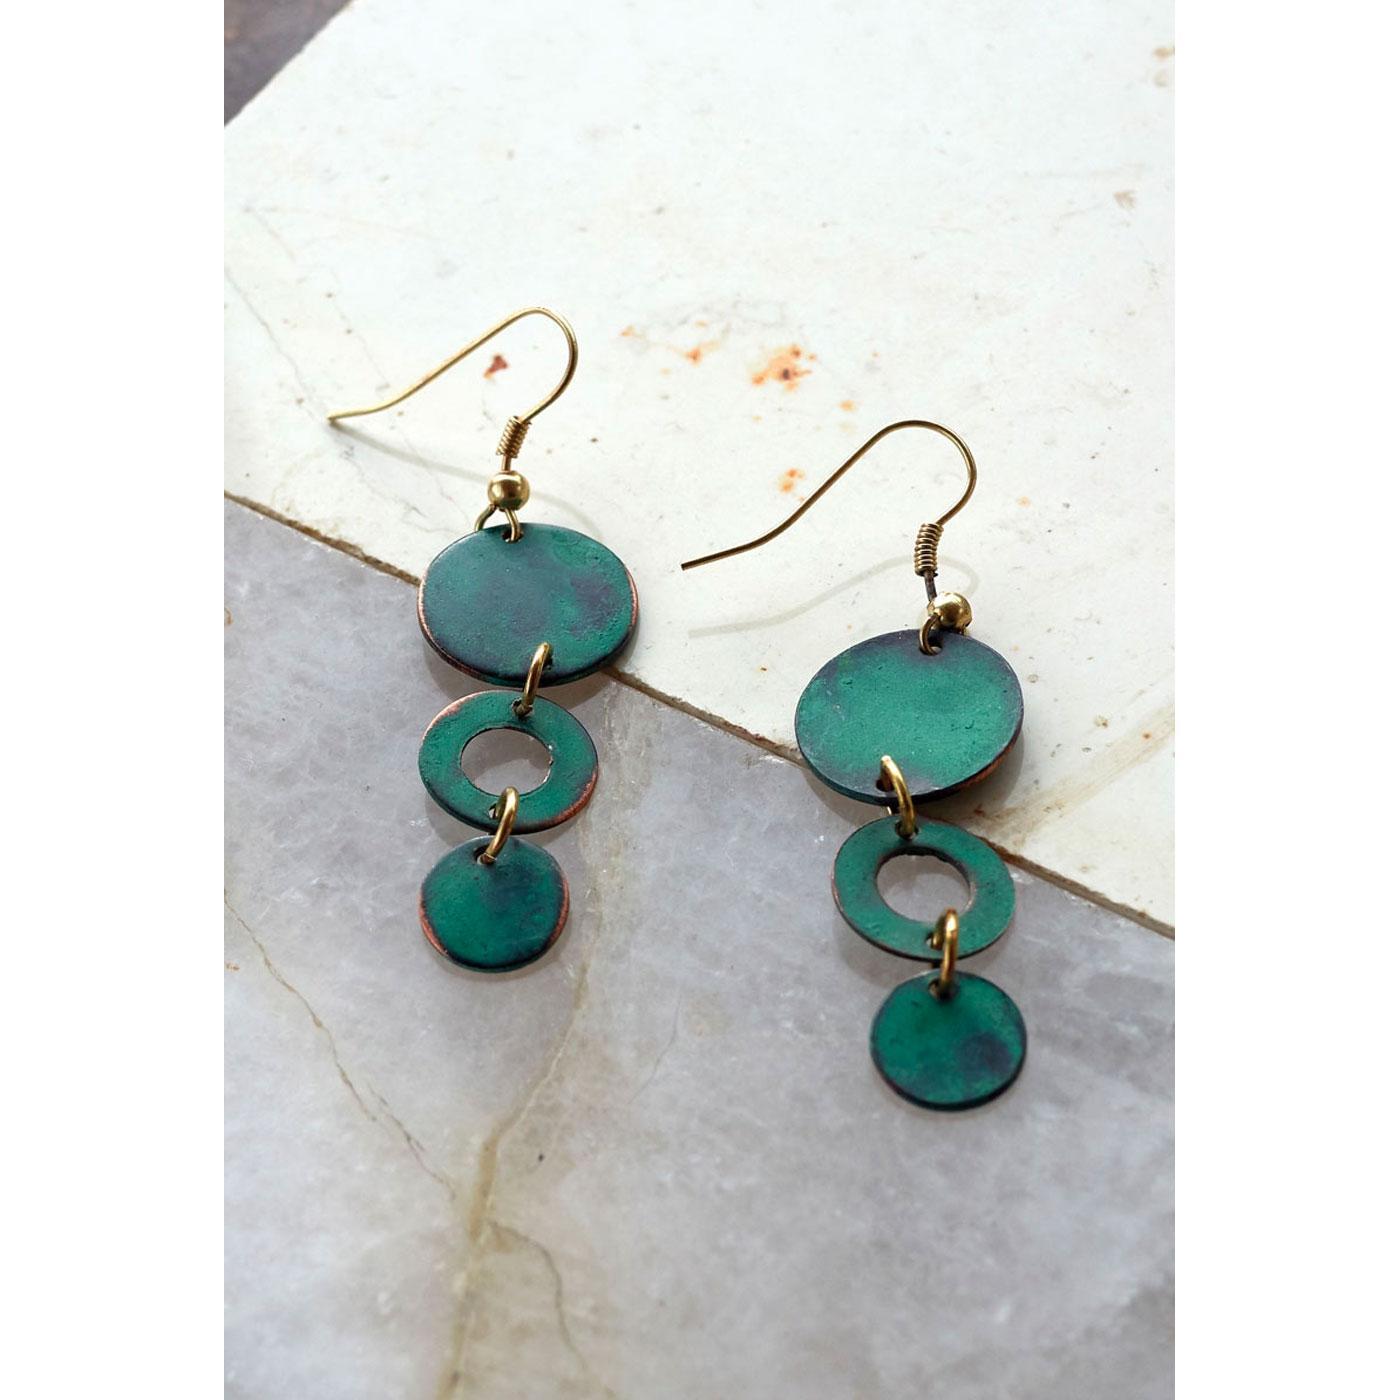 + NOMADS Fair Trade Triple Circle Drop Earrings